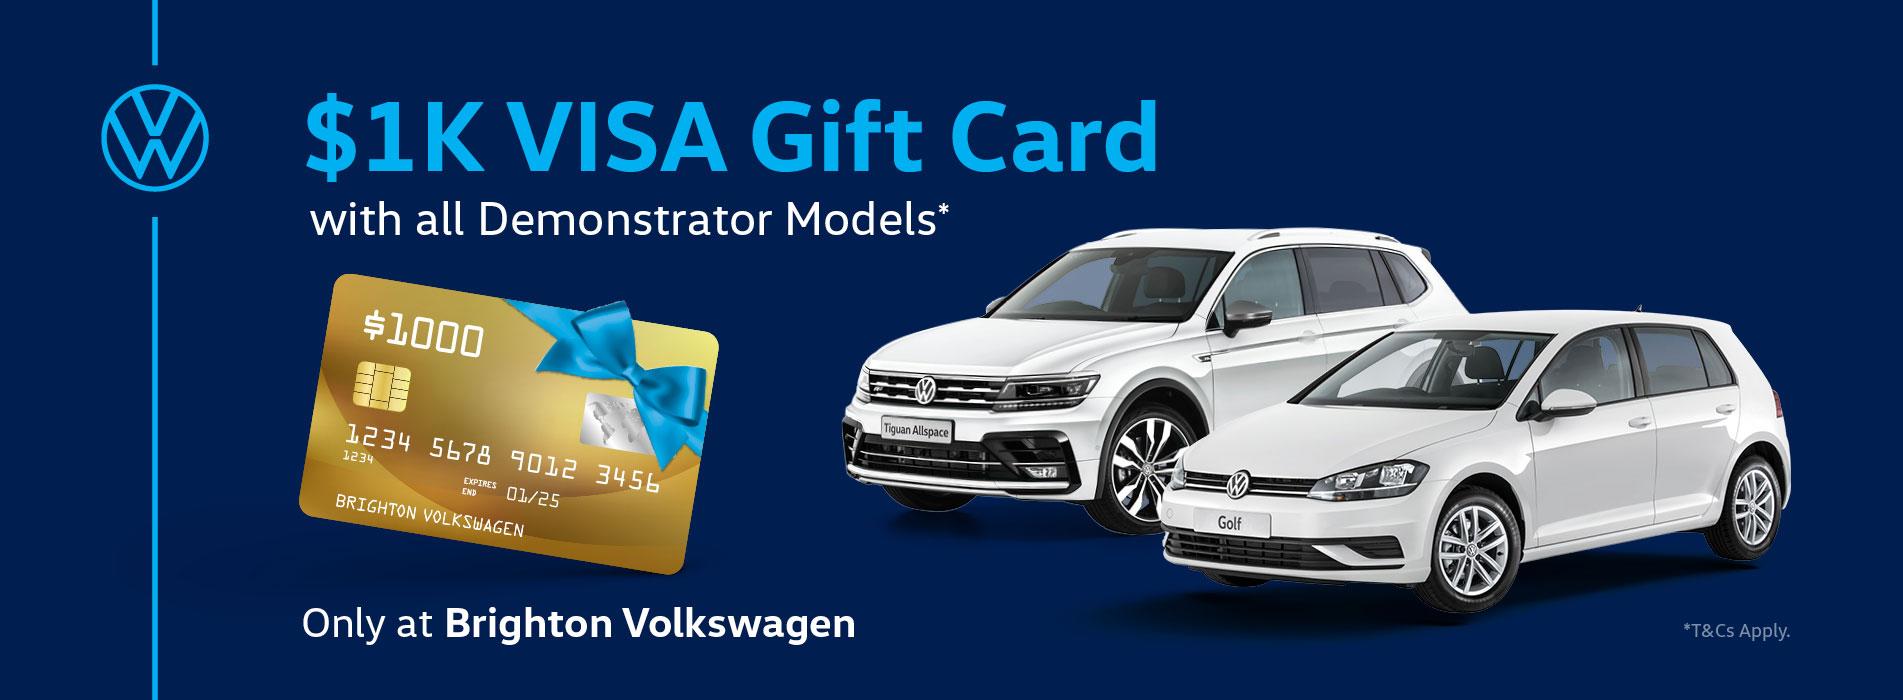 $1K VISA Gift Card with all Demonstrator Models*